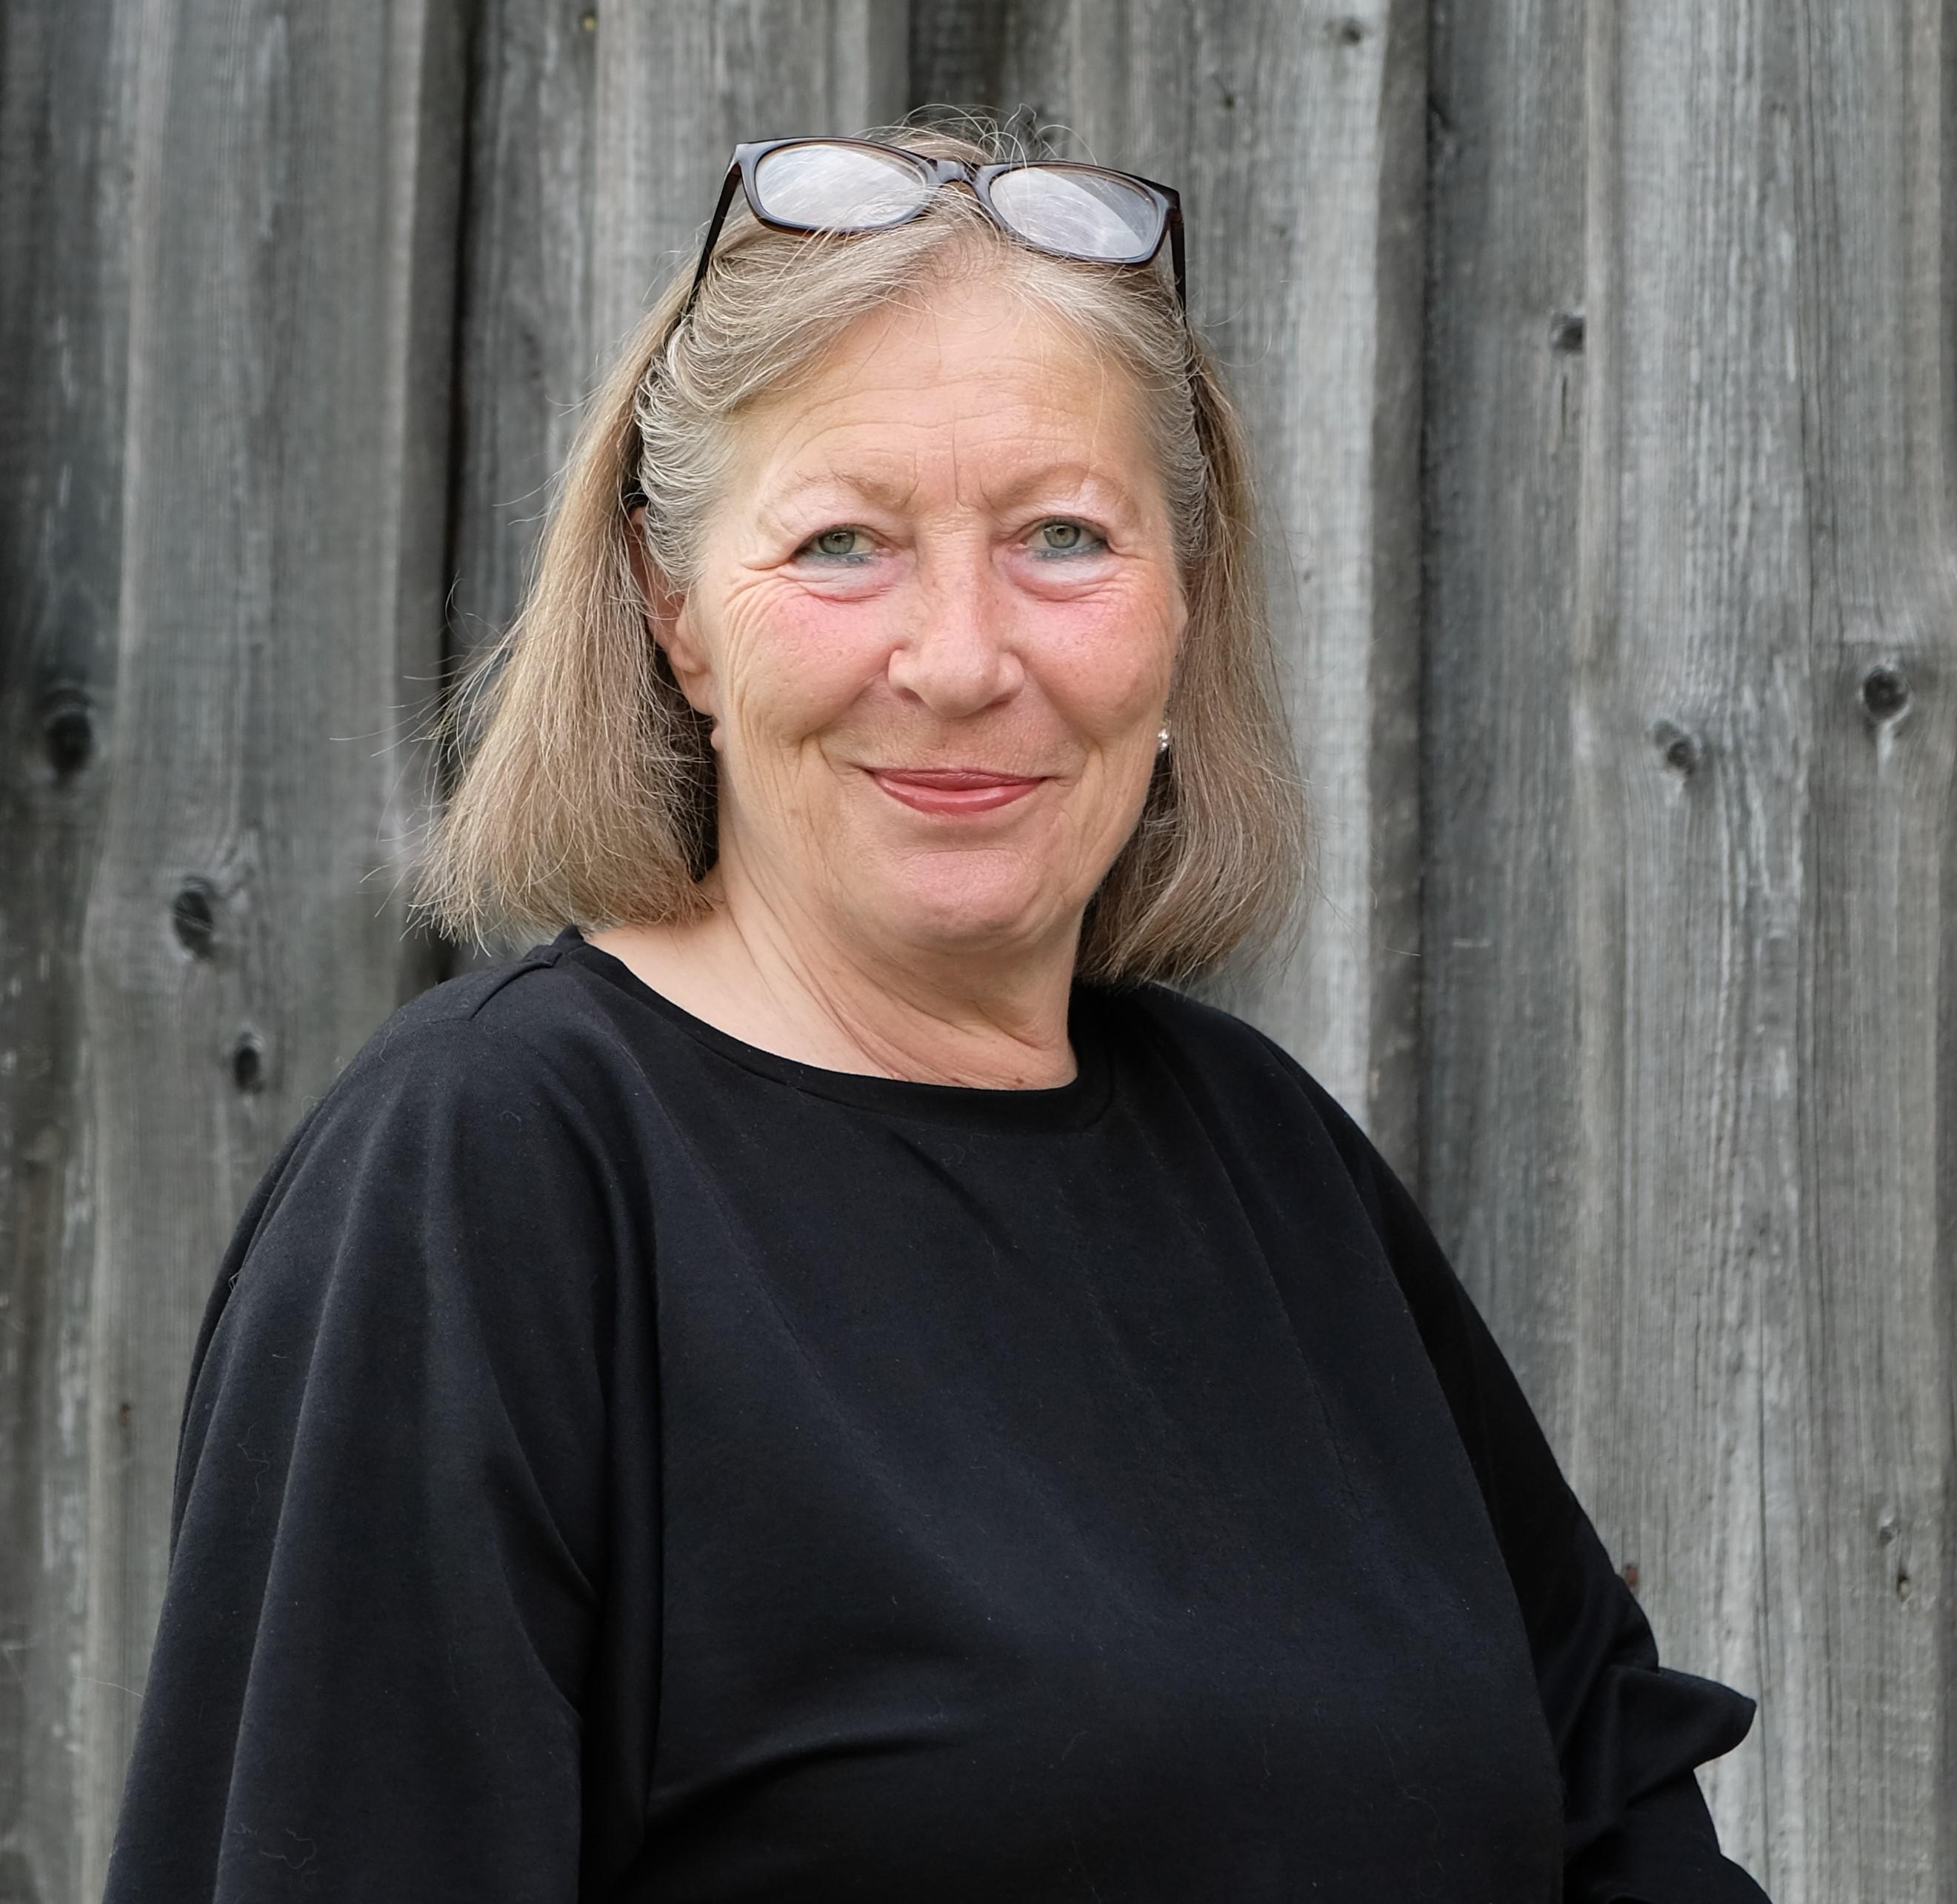 Angelika Langer Heilpraktikerin im Allgäu